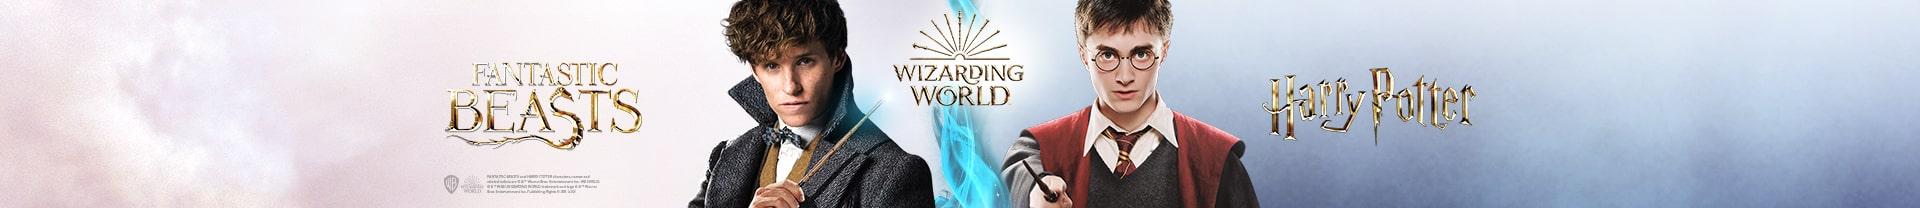 Мерч Wizarding World - атрибутика, подарки, одежда